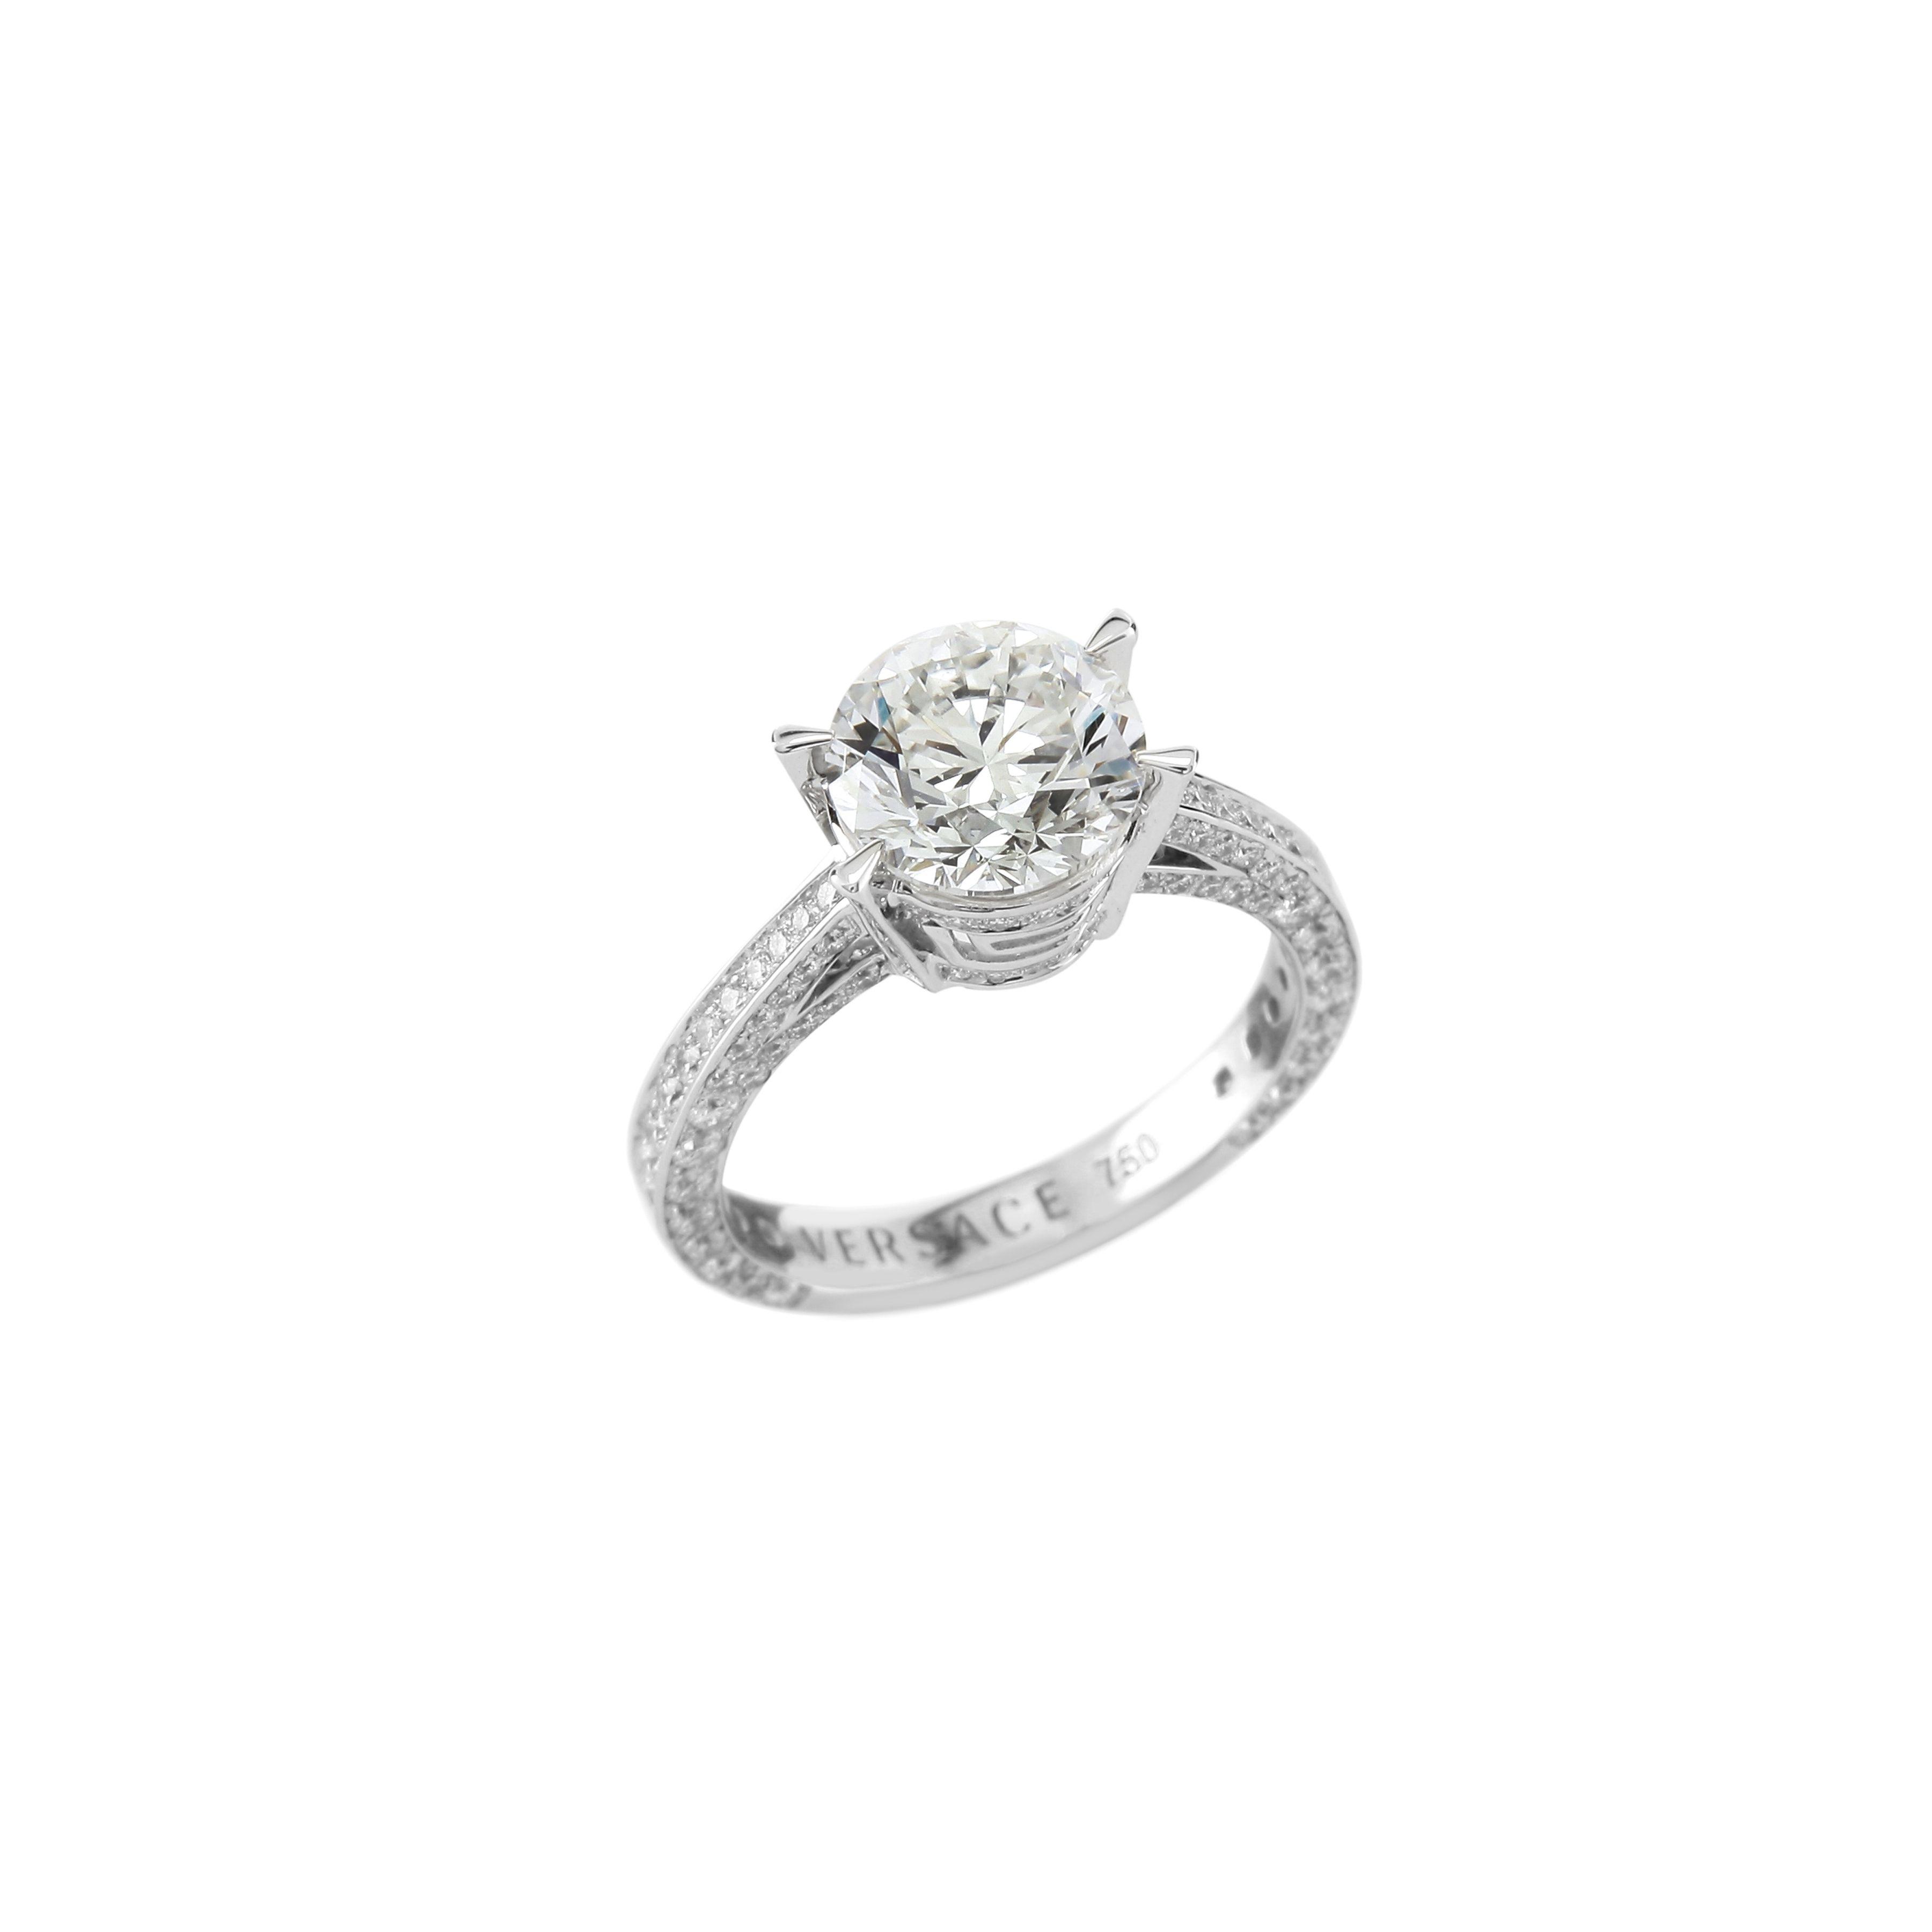 The Versace Fine Jewellery VERSACE FOREVER Ring VersaceJewellery